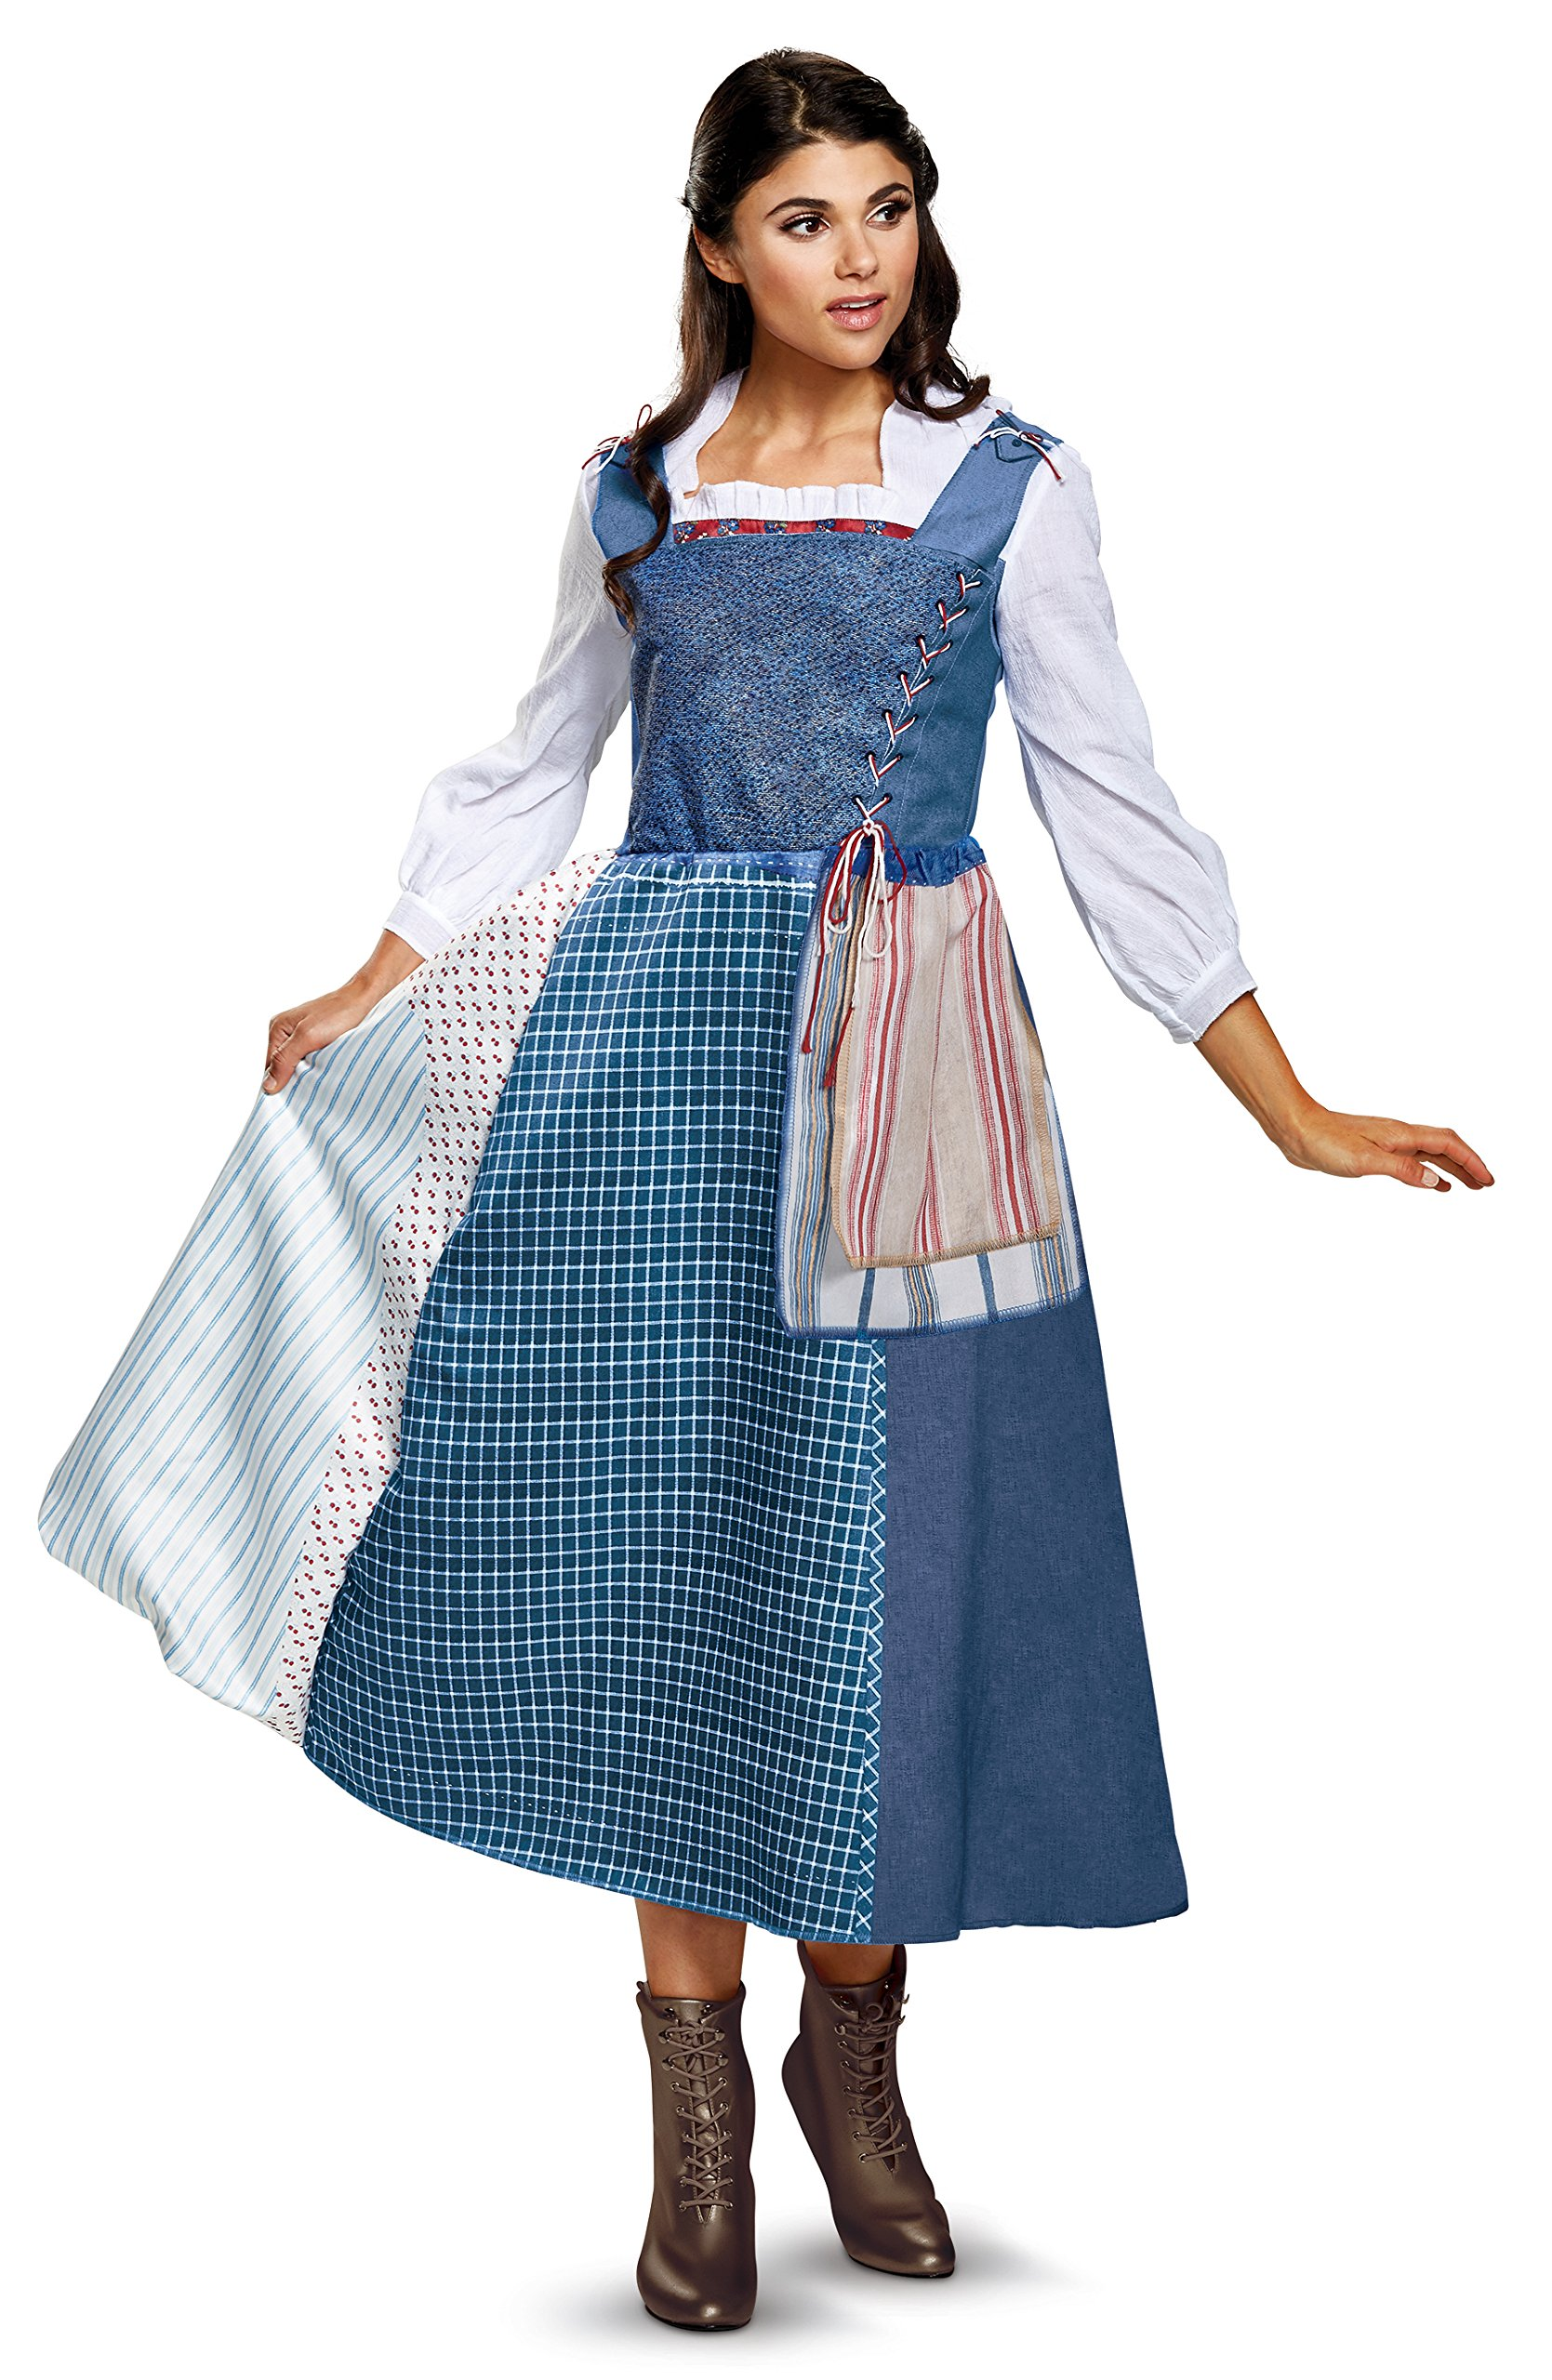 Disney Women's Belle Village Dress Deluxe Adult Costume, Multi, Medium